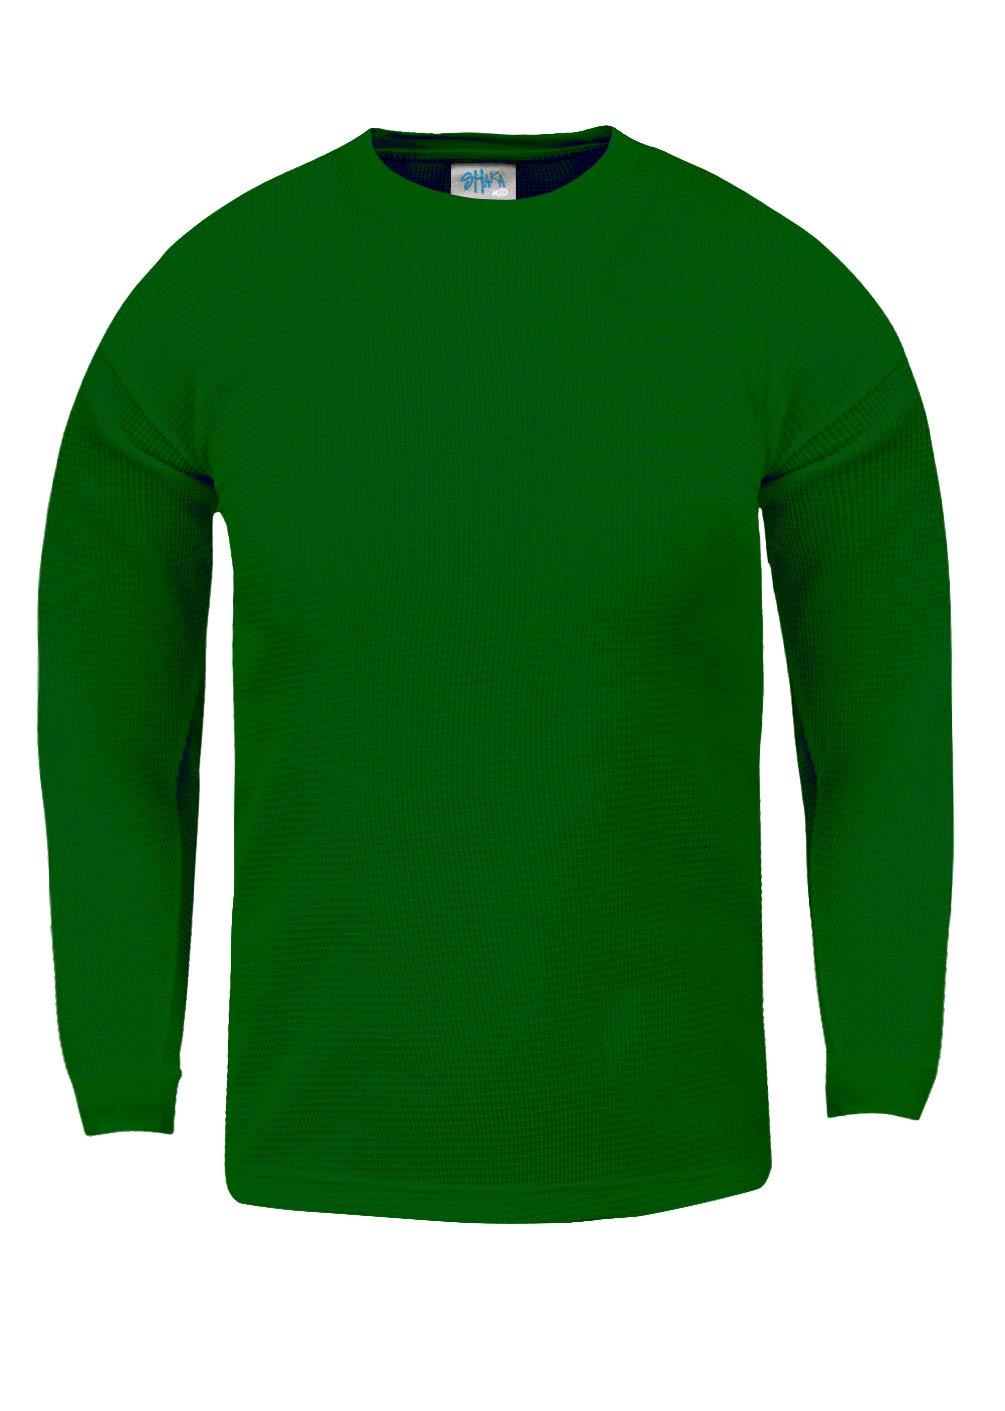 Shaka Wear KTC06_XS Thermal Long Sleeve Crewneck Waffle Shirt Kelly Green XS by Shaka Wear